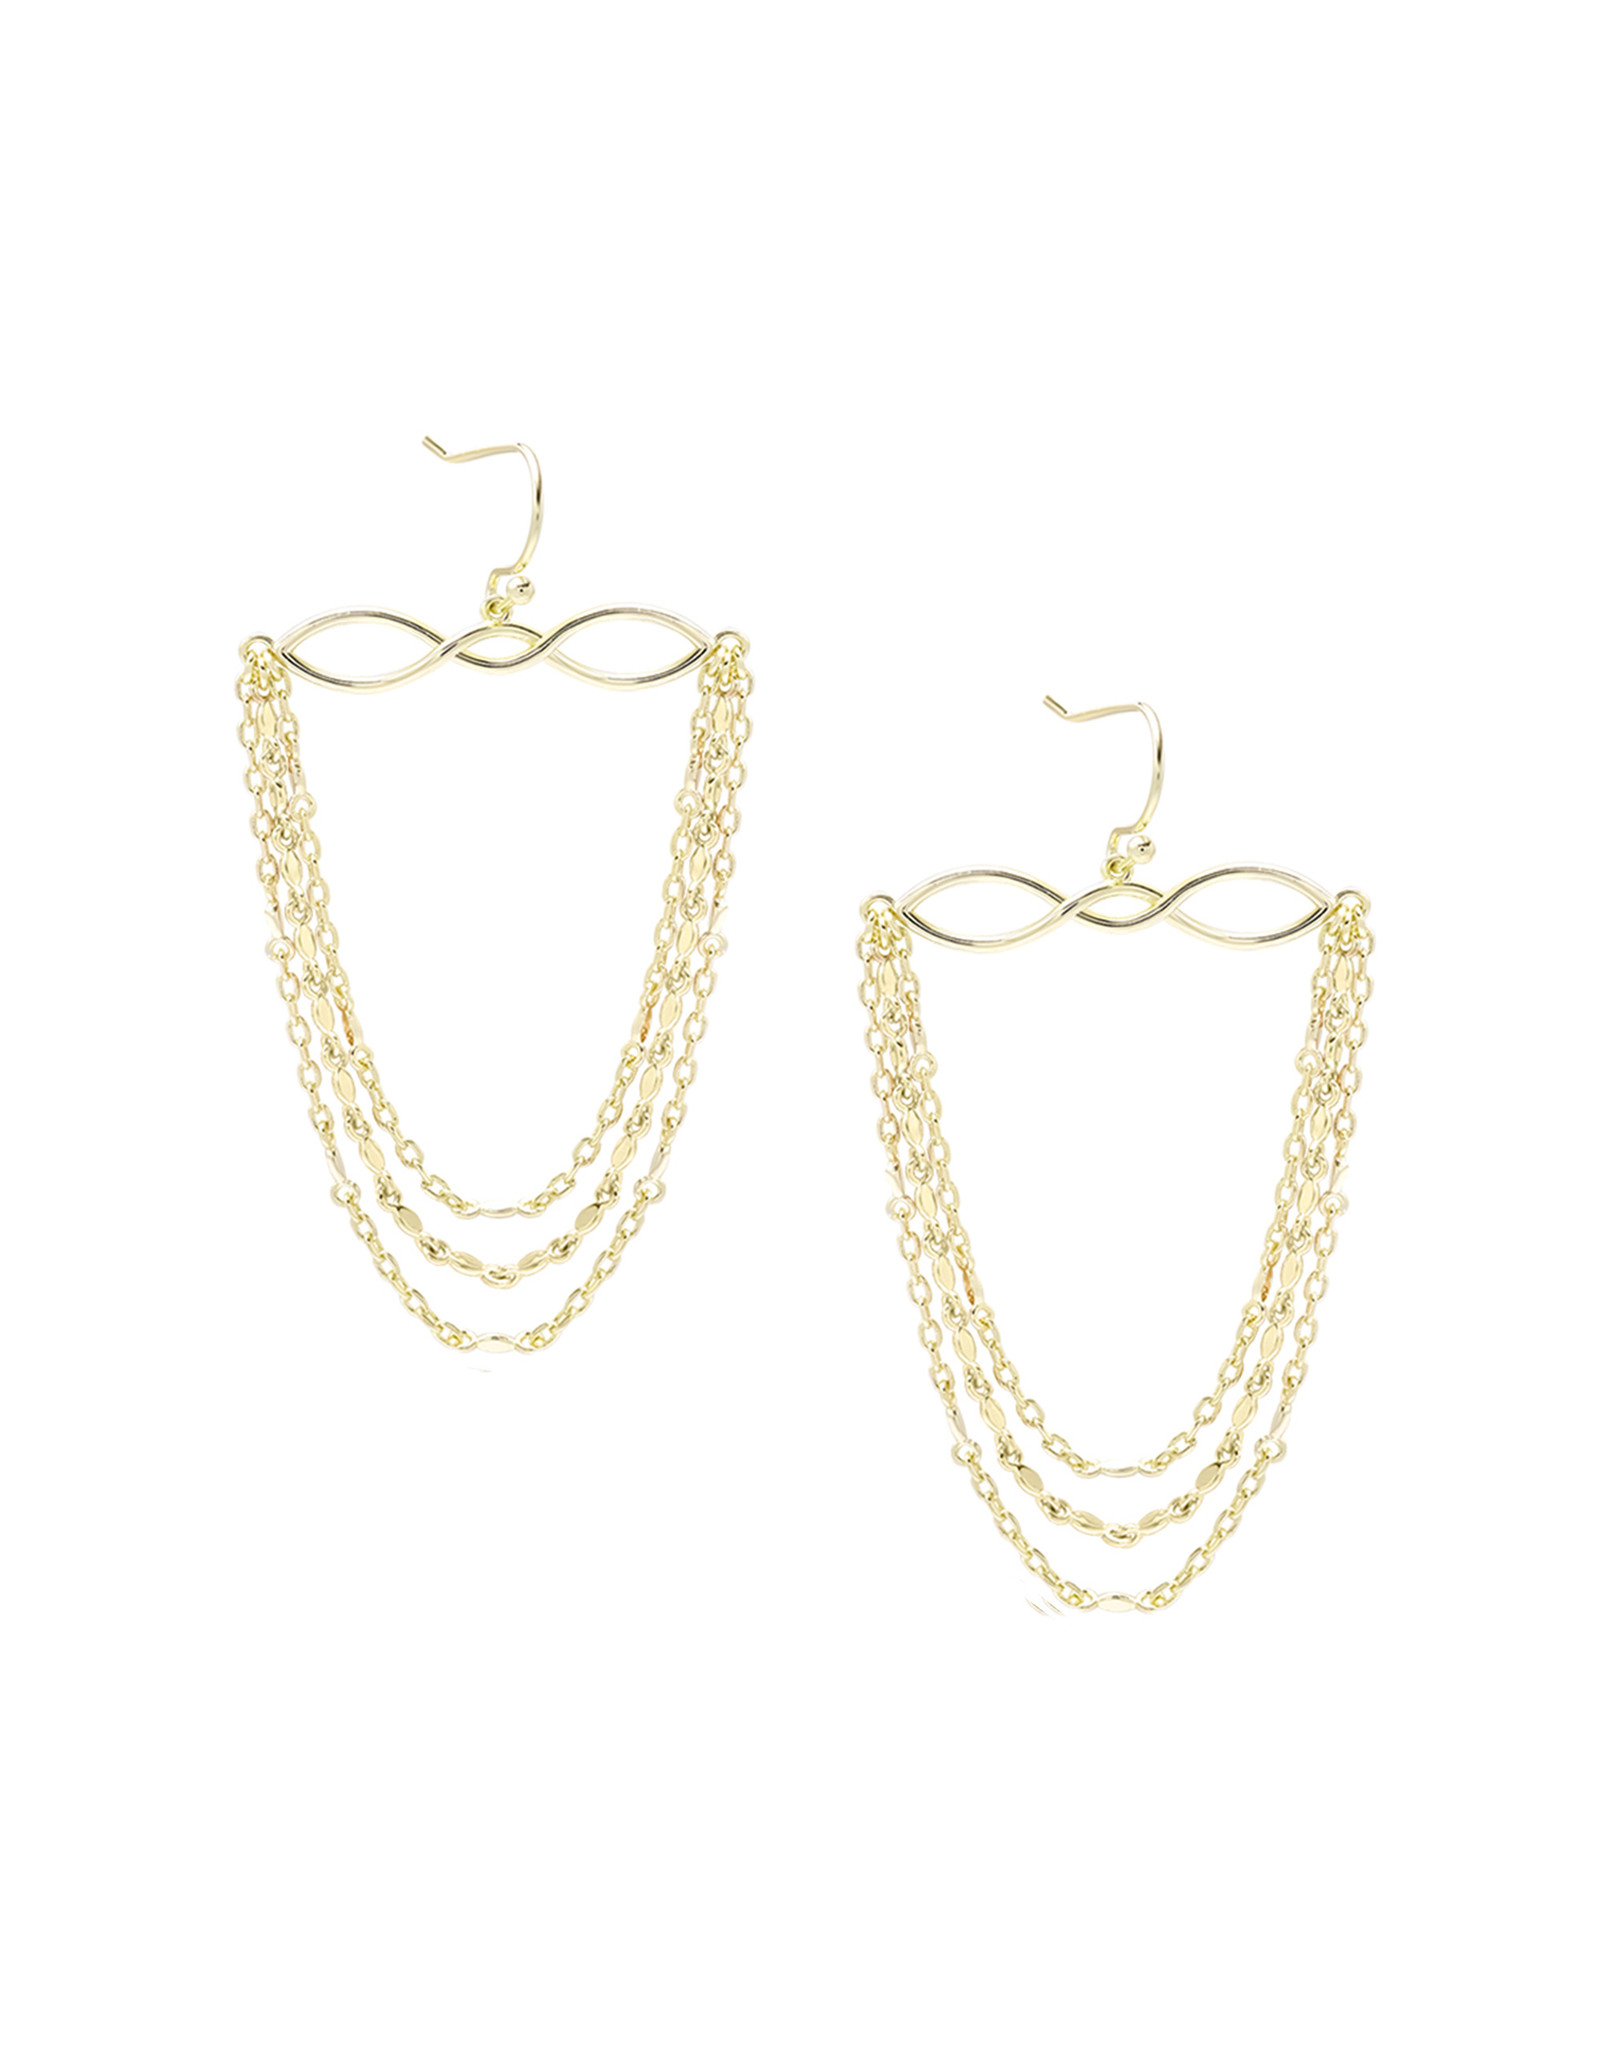 Natalie Wood Designs Blossom Earrings - Gold